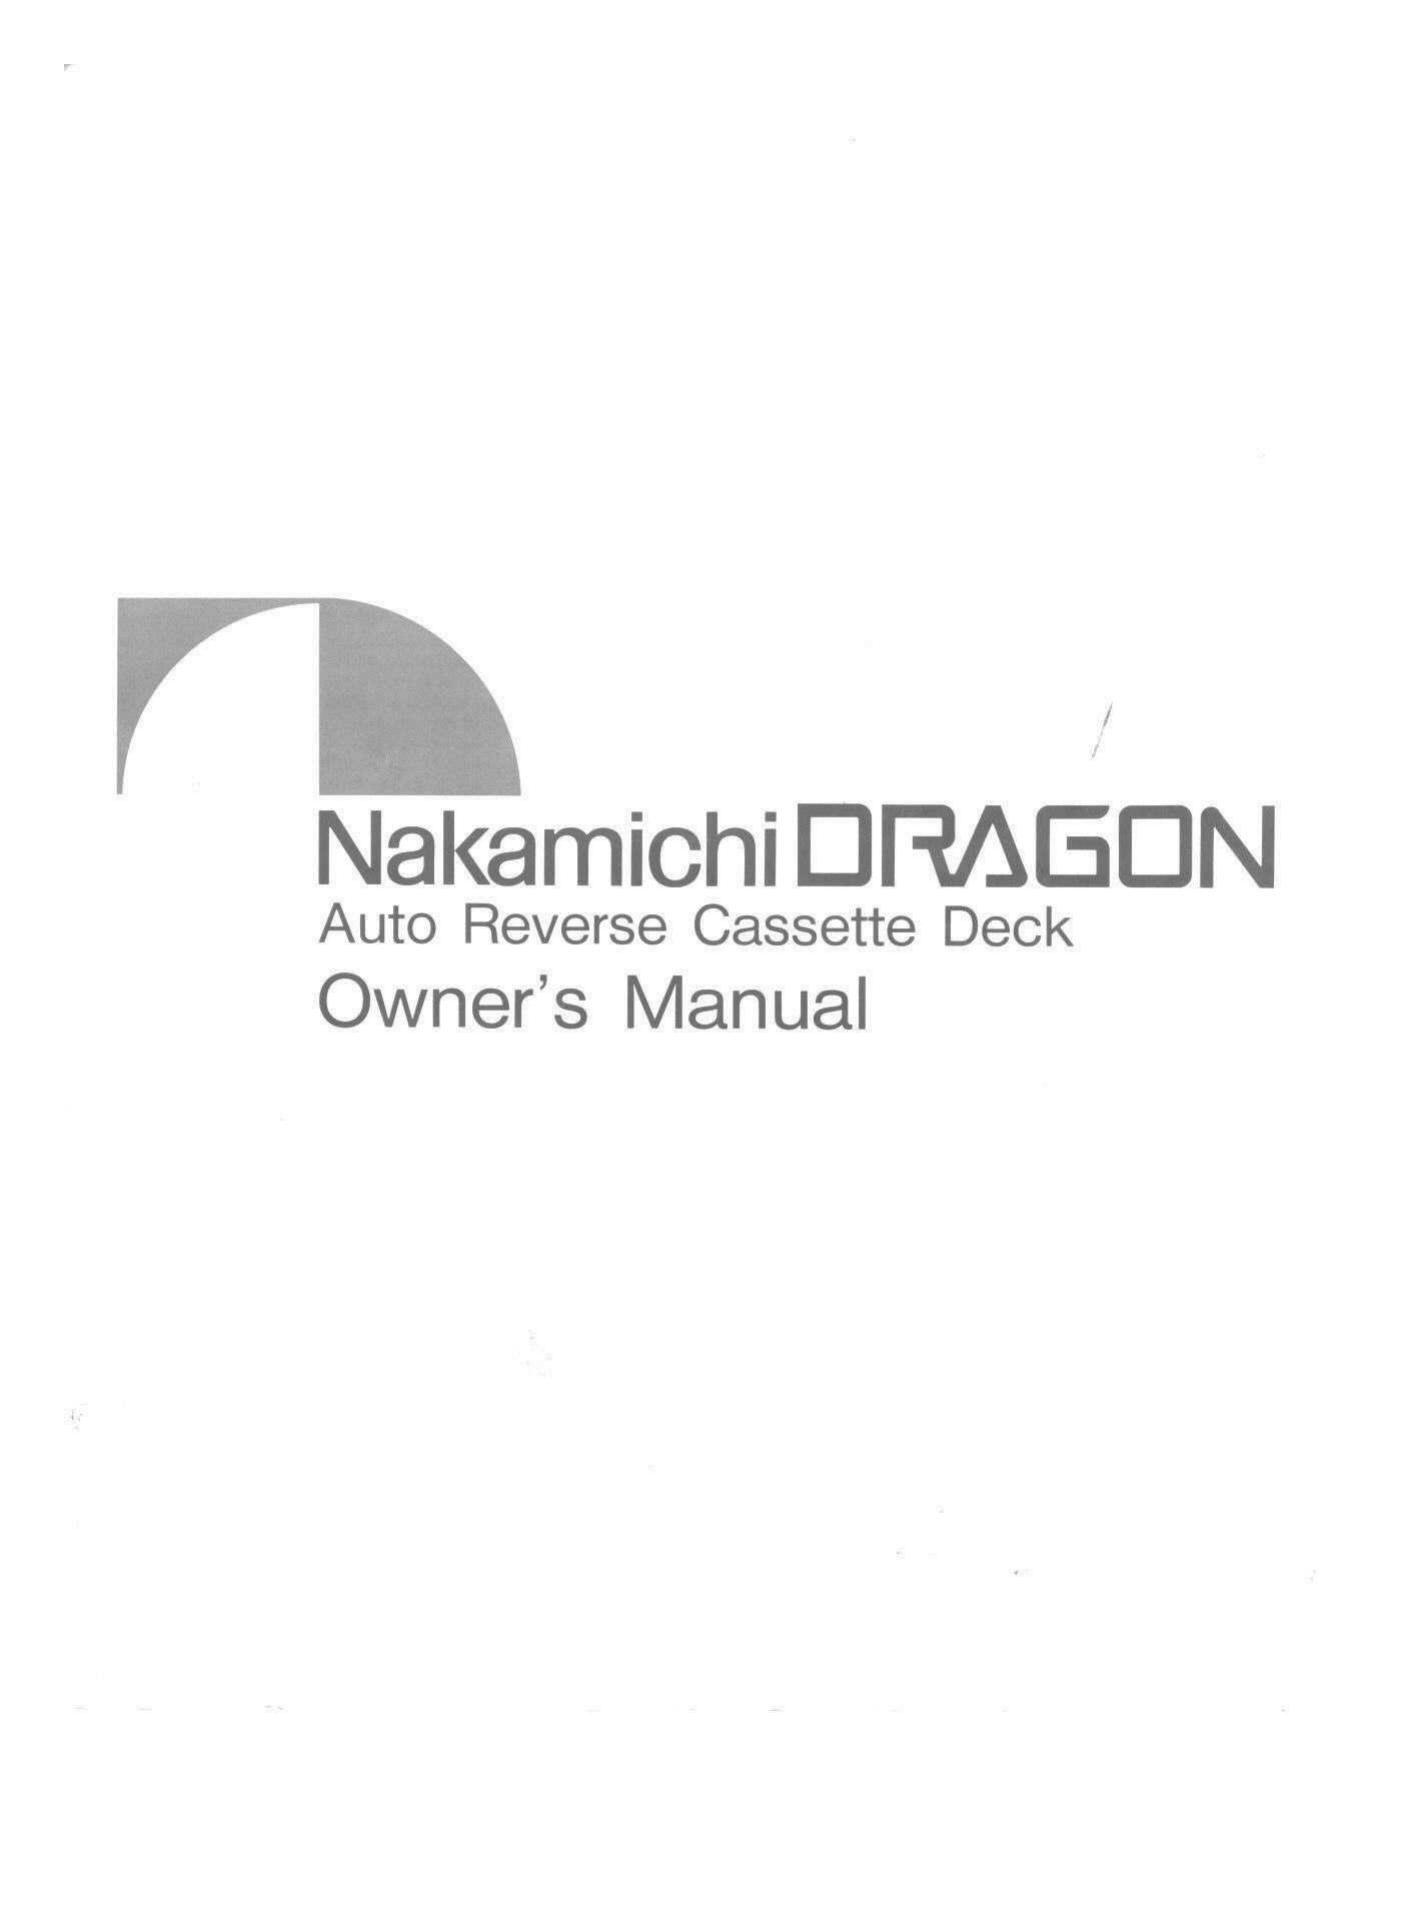 nakamichi dragon owners manual rh audioservicemanuals com nakamichi dragon owners manual Nakamichi Dragon CD Player